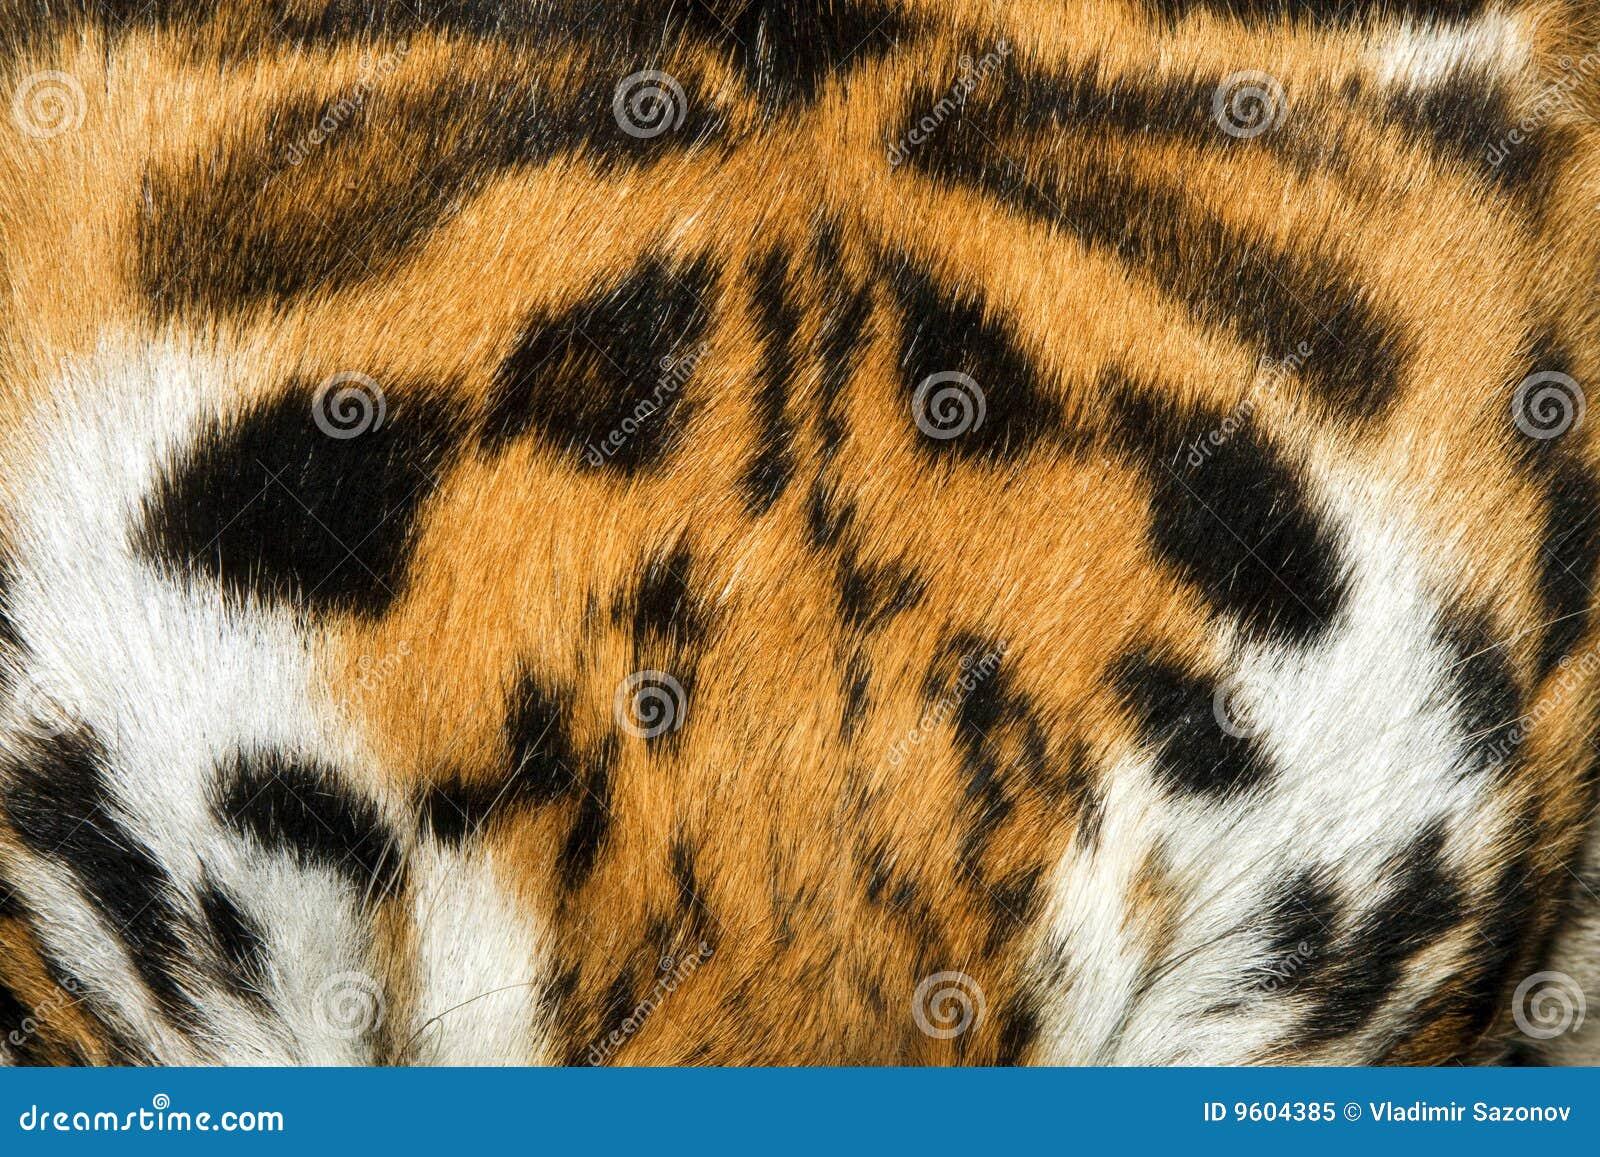 Tiger Fur Texture (real) Royalty Free Stock Photo - Image ...